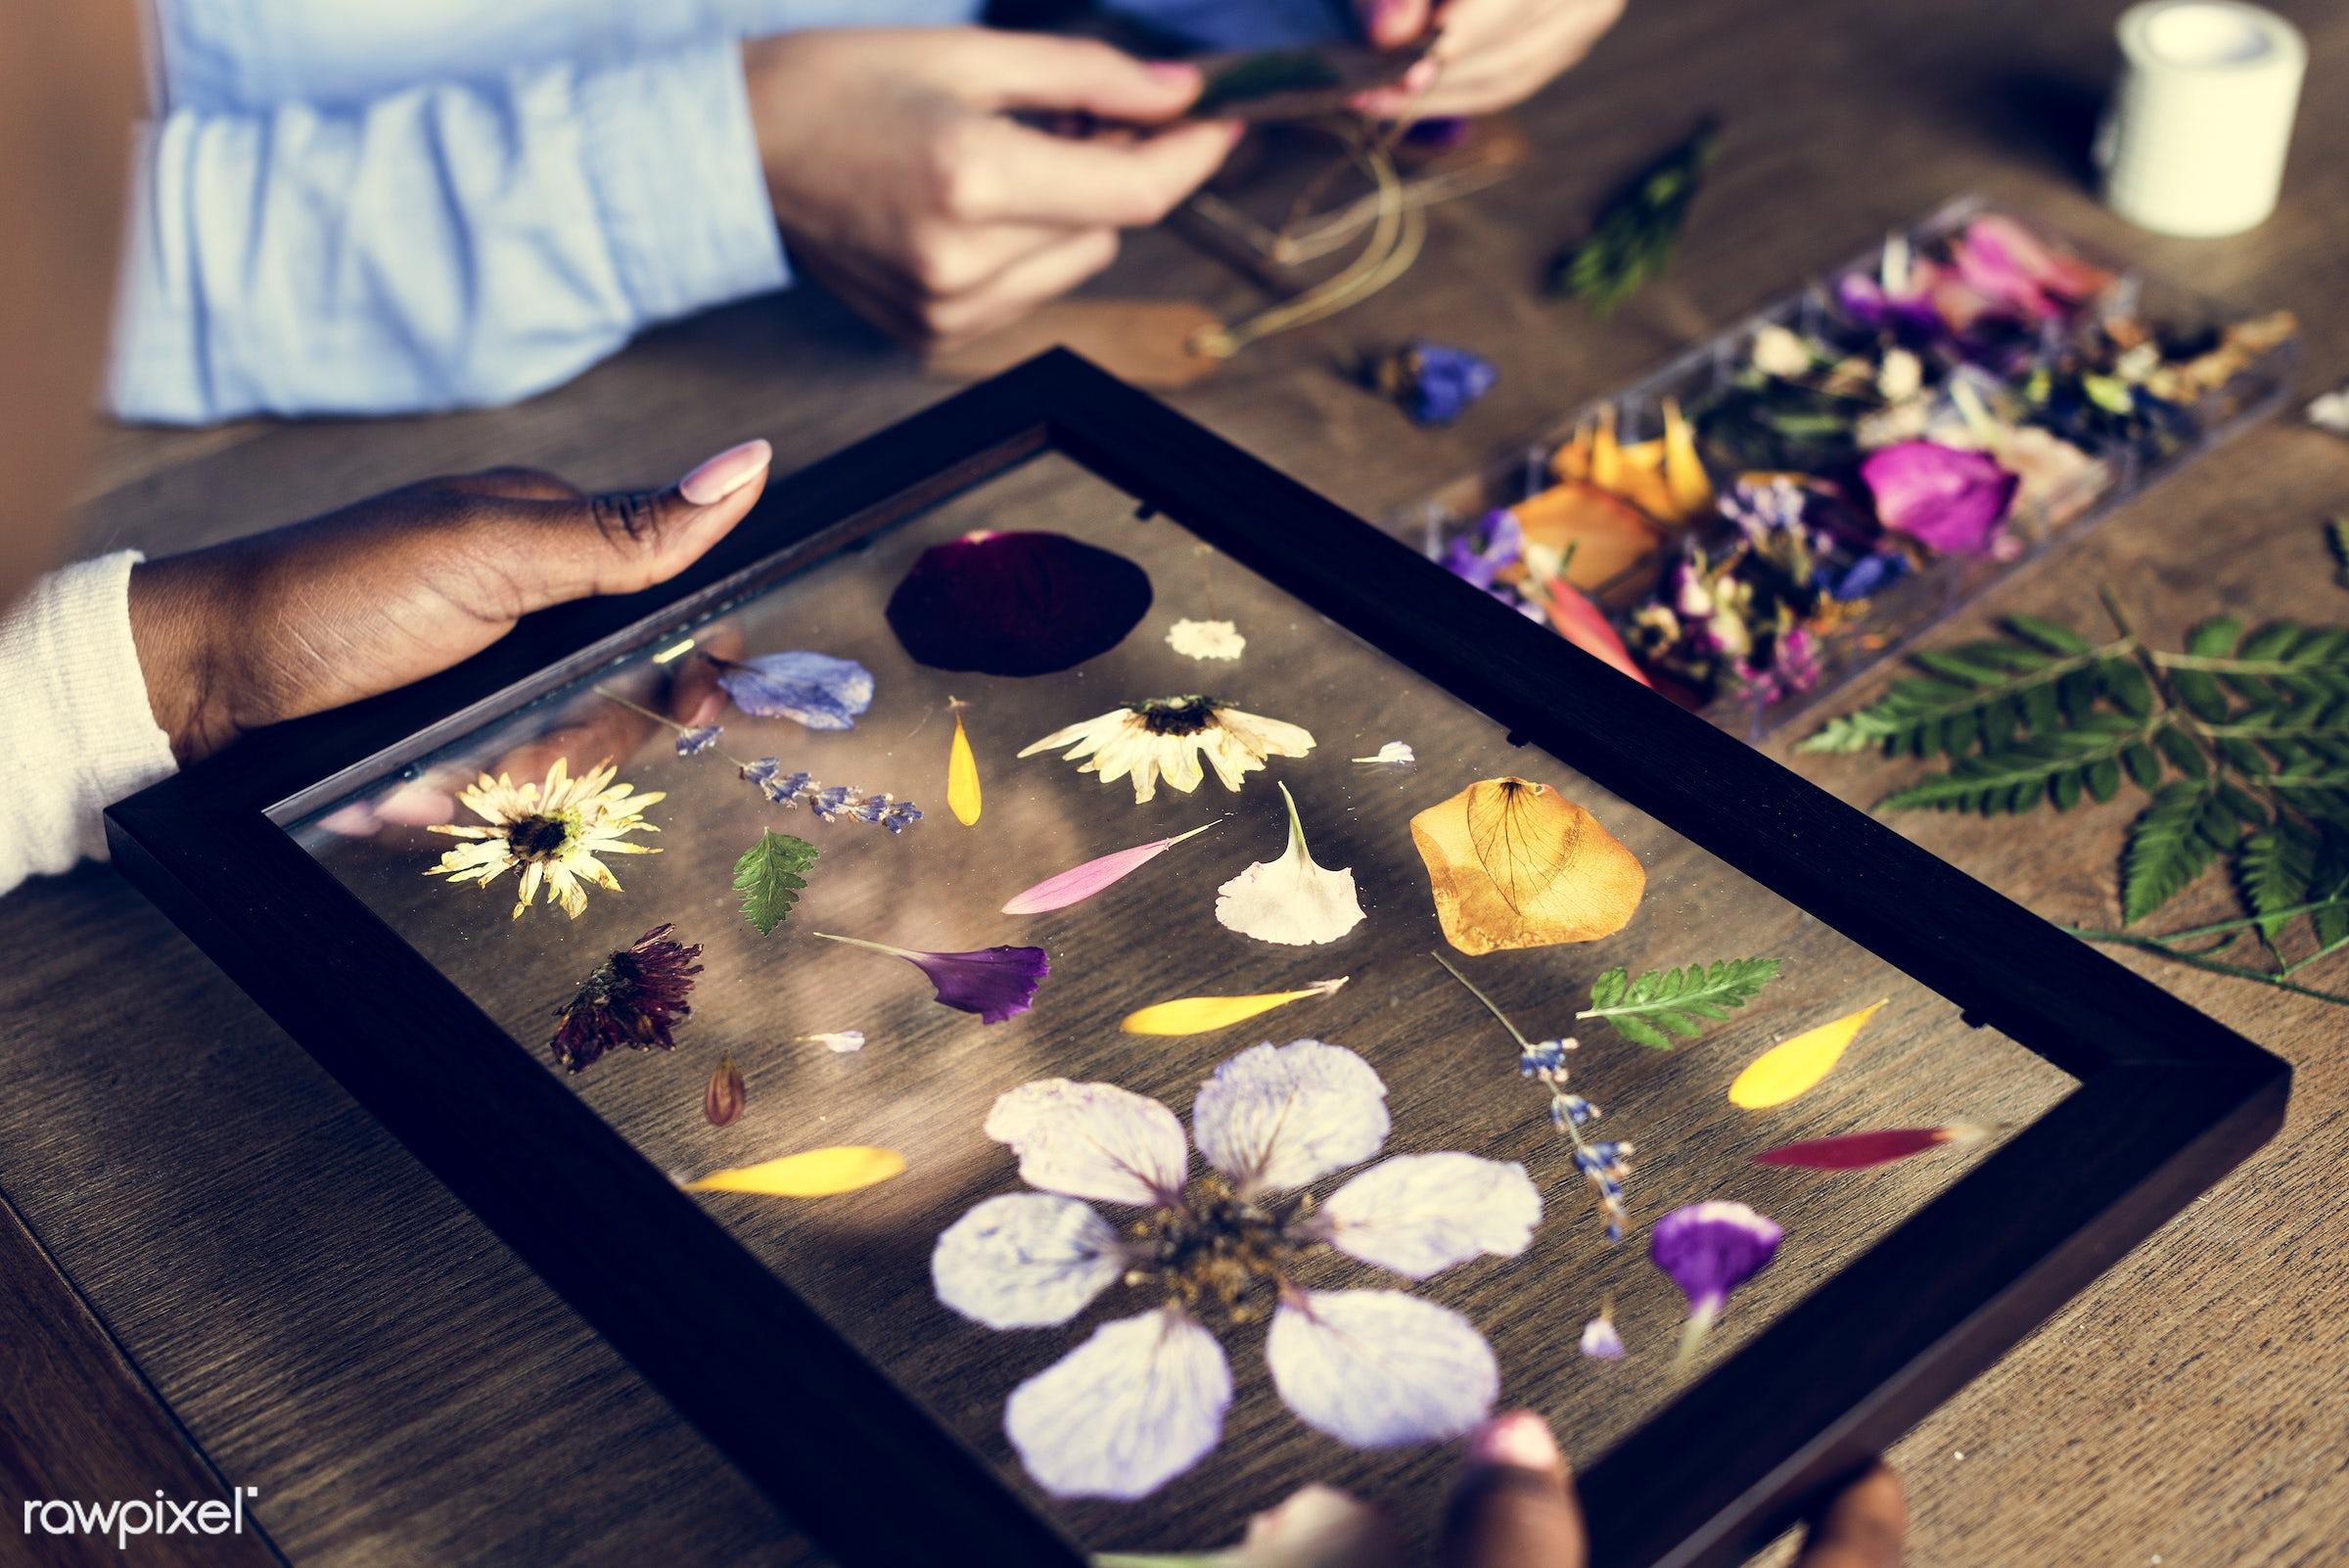 craft, aromatic, decorative, handicraft, beauty, rustic, handiwork, nature, style, hands, dry, vintage, flora, art,...